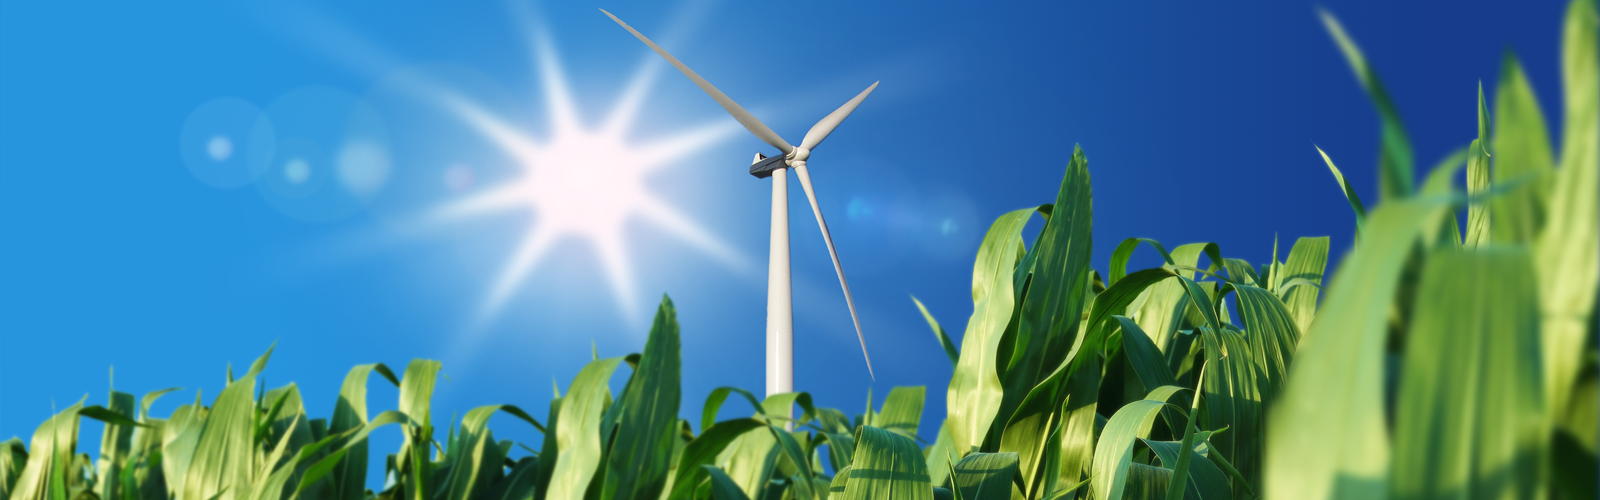 MOOC: Sustainable Energy: Design A Renewable Future | TU